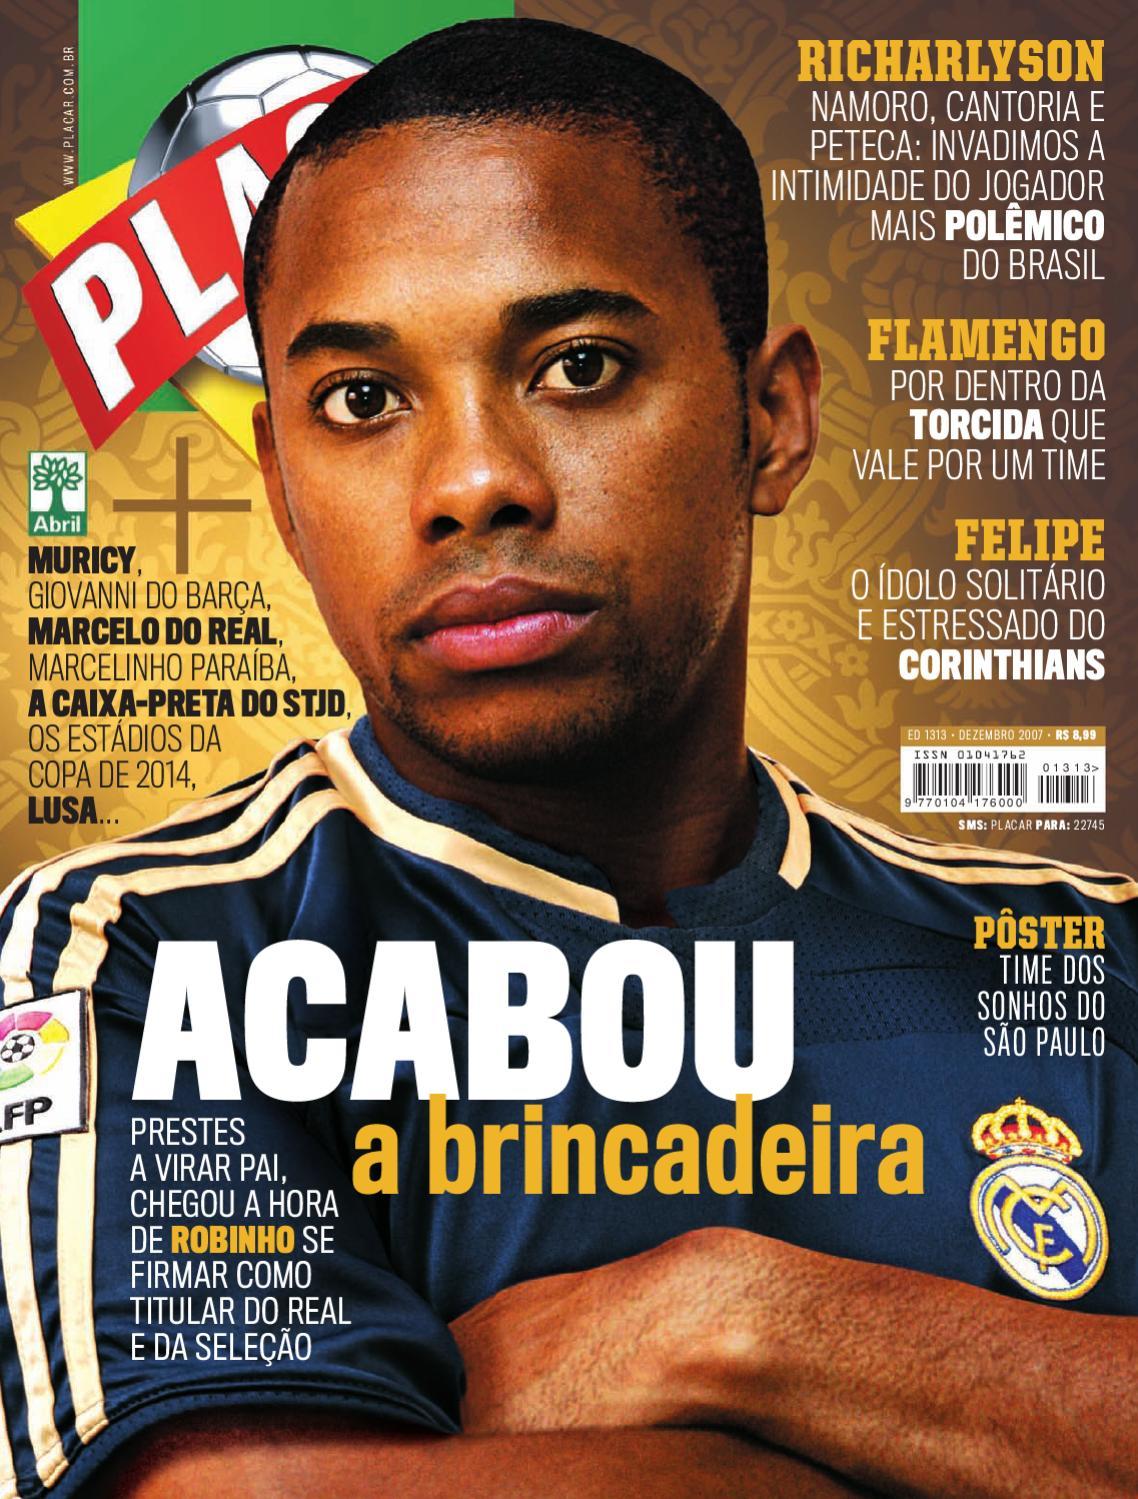 Placar Dezembro 2007 by Revista Placar - issuu 94bba9839b4a1